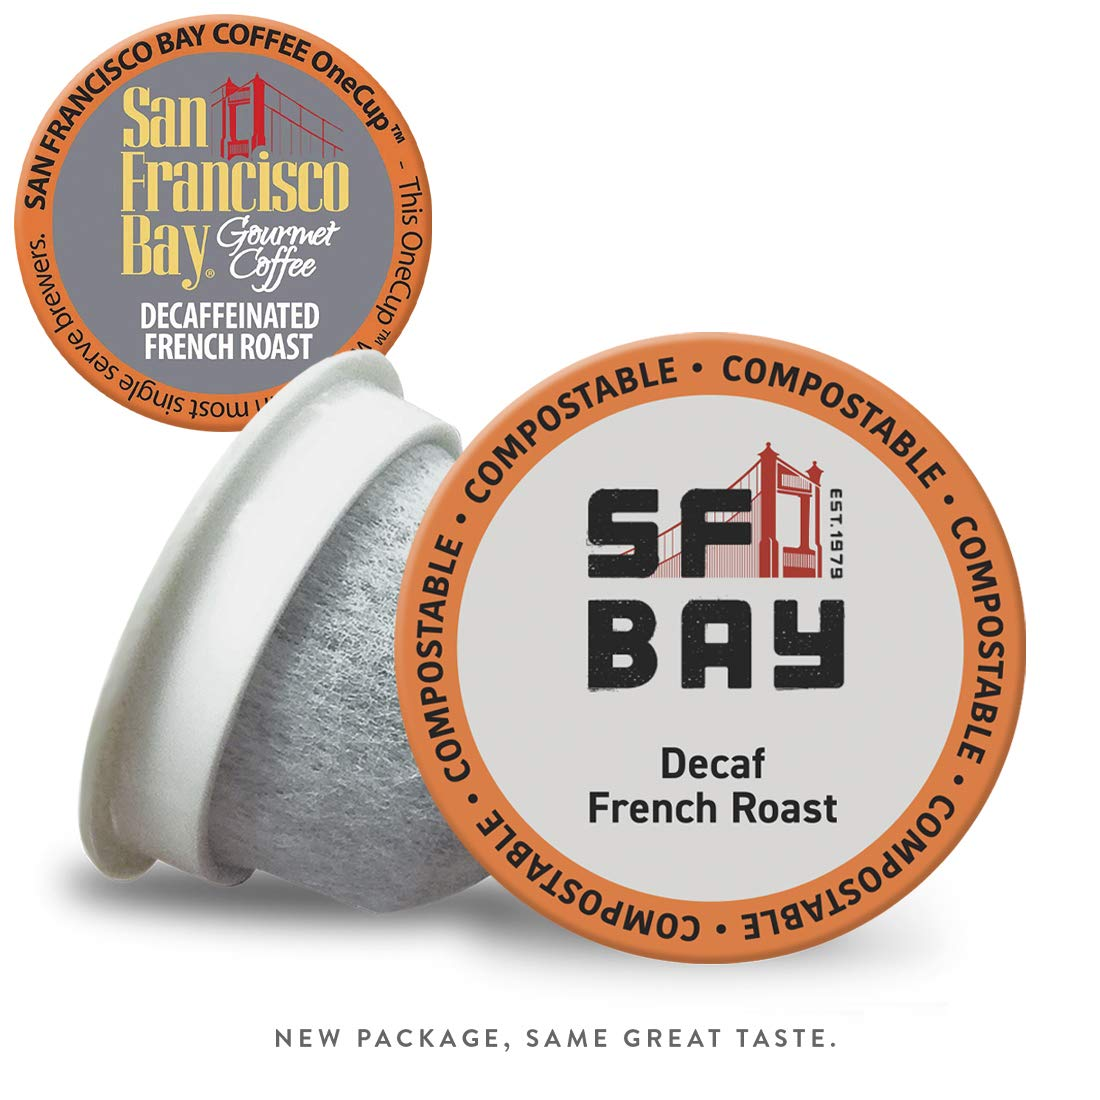 San Francisco Bay K cup Coffee